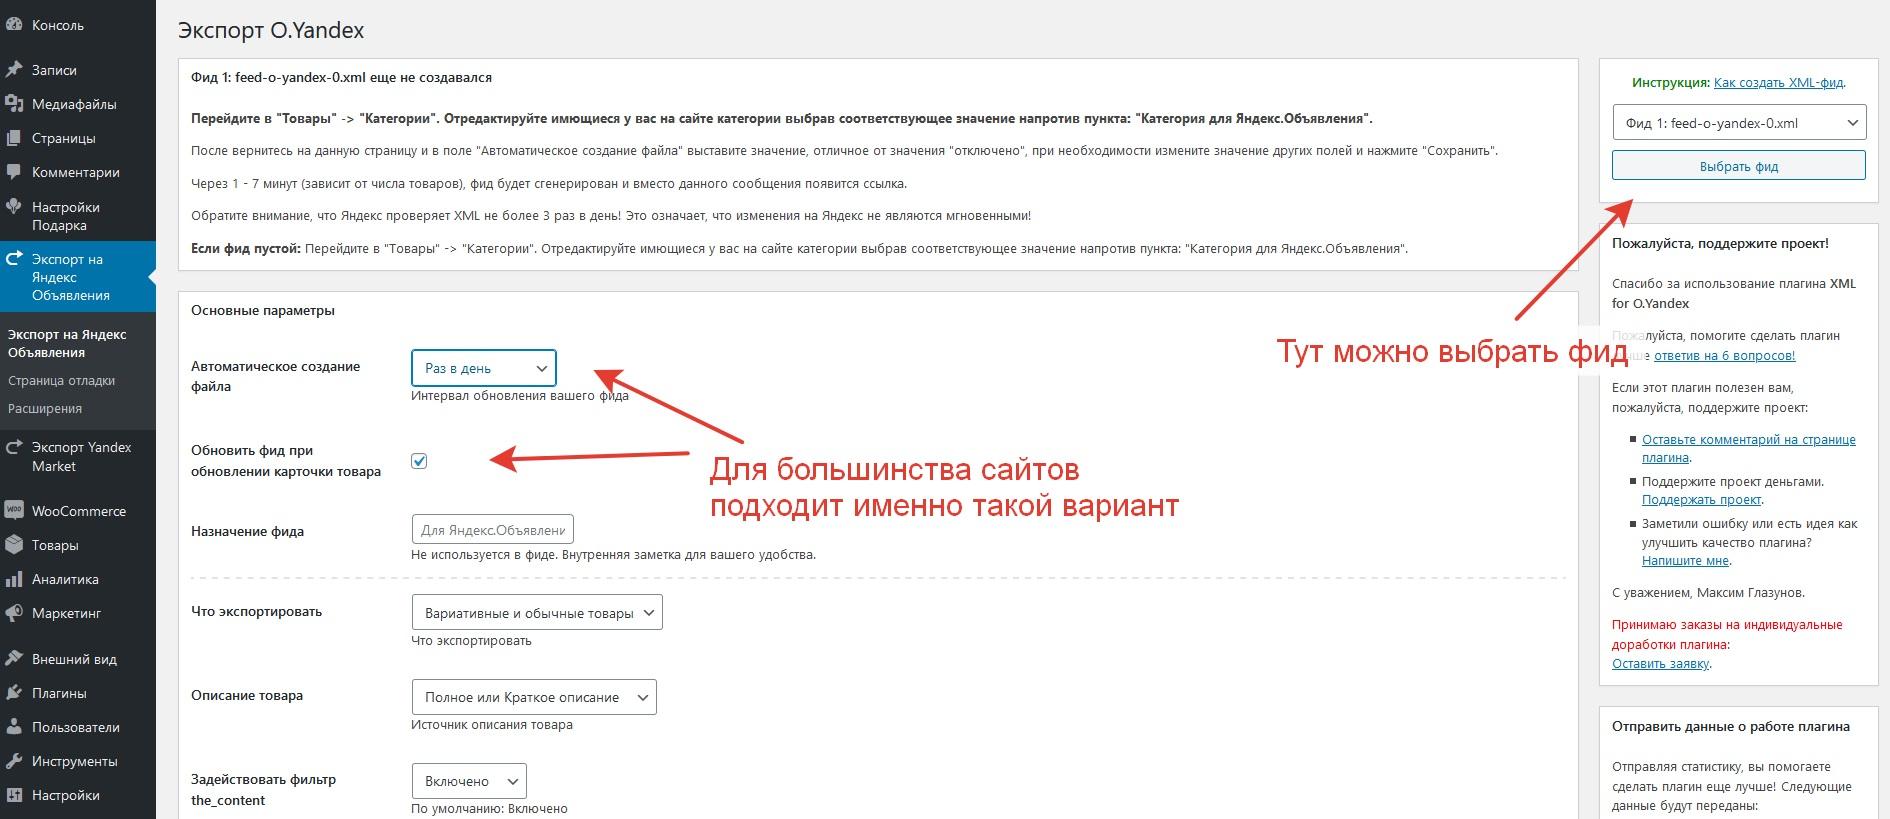 Инструкция по настройке плагина XML for O.Yandex (Яндекс Объявления)